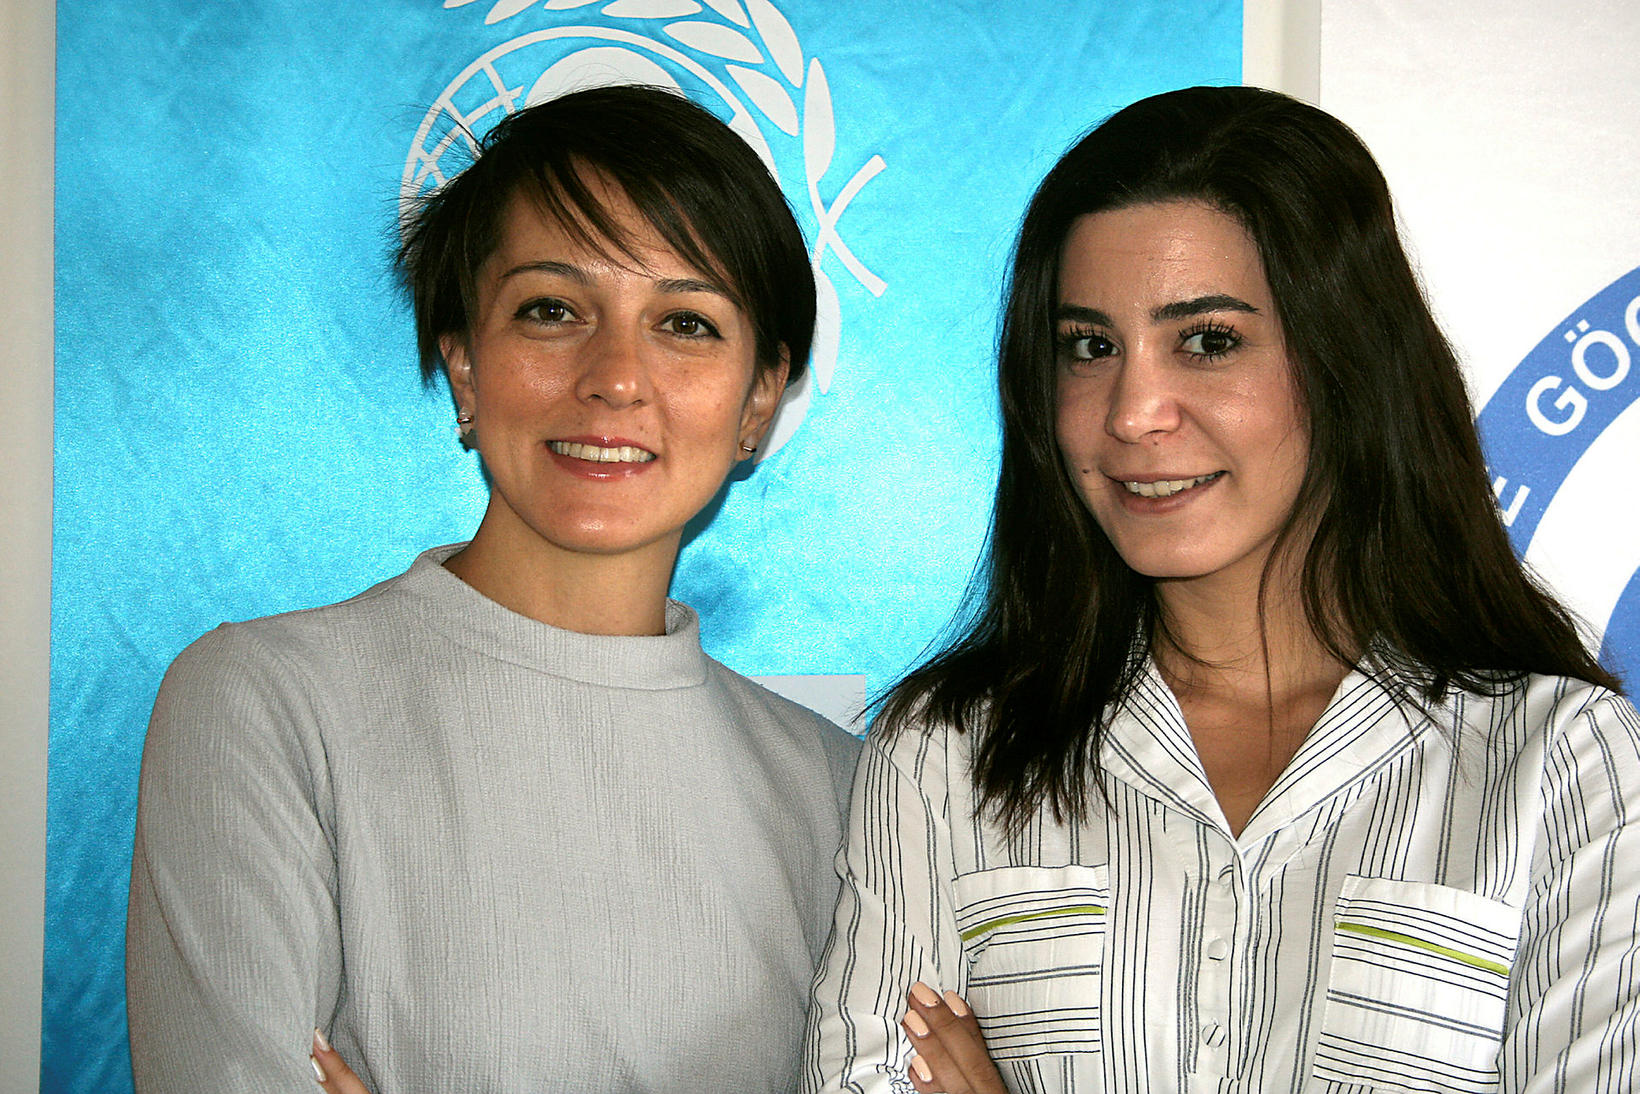 Sezen Yakin starfar hjá UNICEF í Gaziantep og Şuheda Kipri …